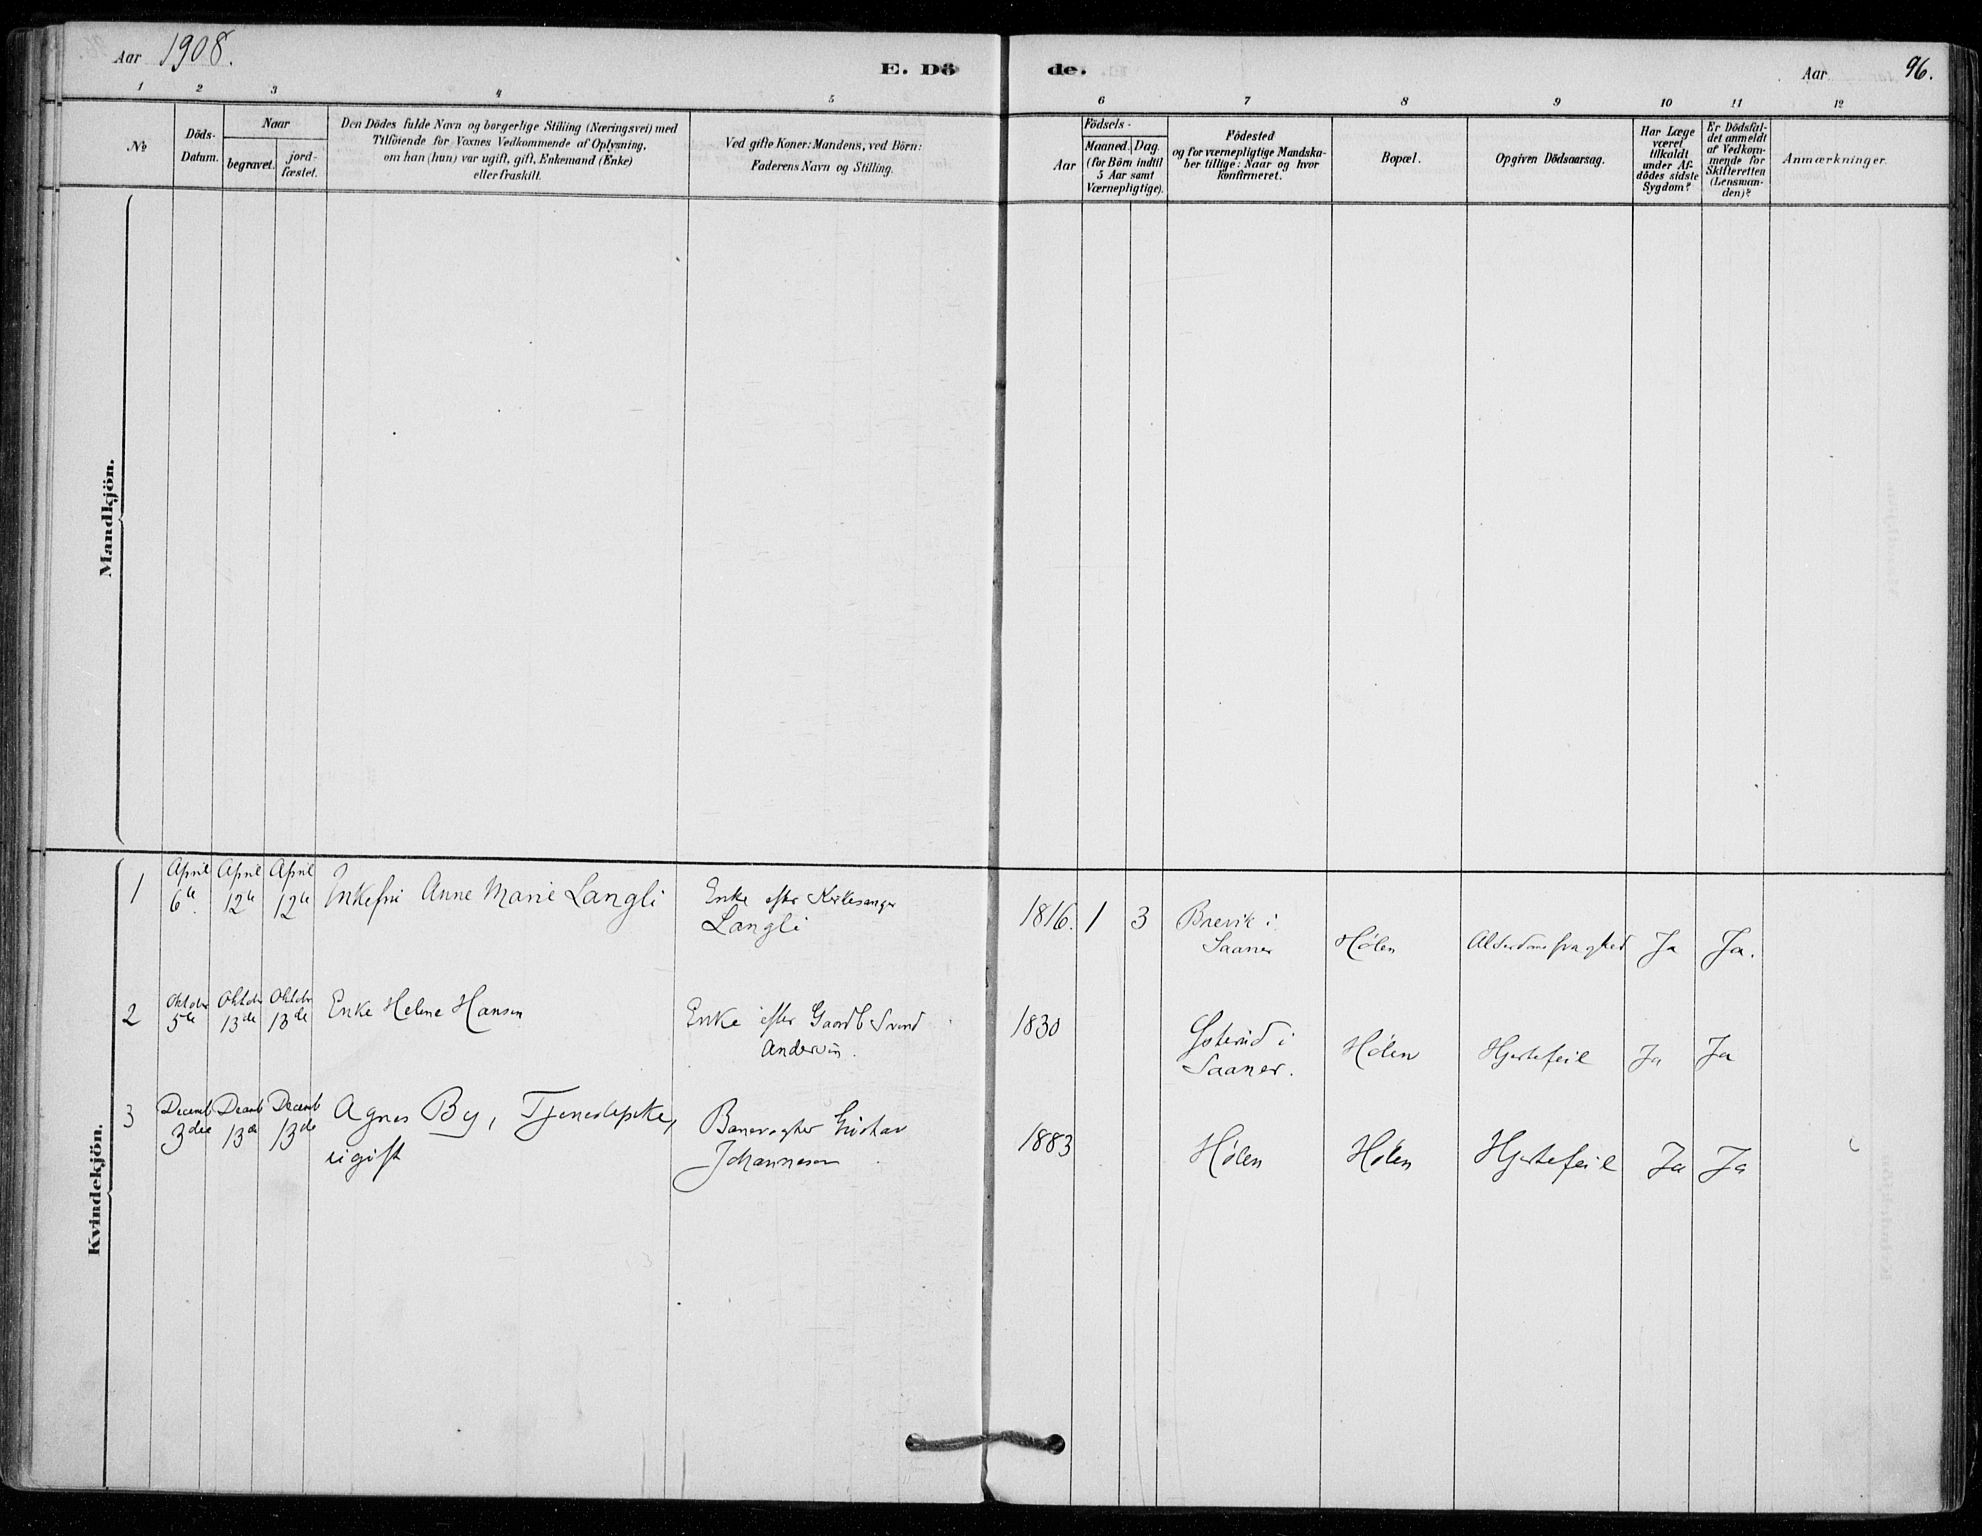 SAO, Vestby prestekontor Kirkebøker, F/Fe/L0001: Ministerialbok nr. V 1, 1878-1931, s. 96